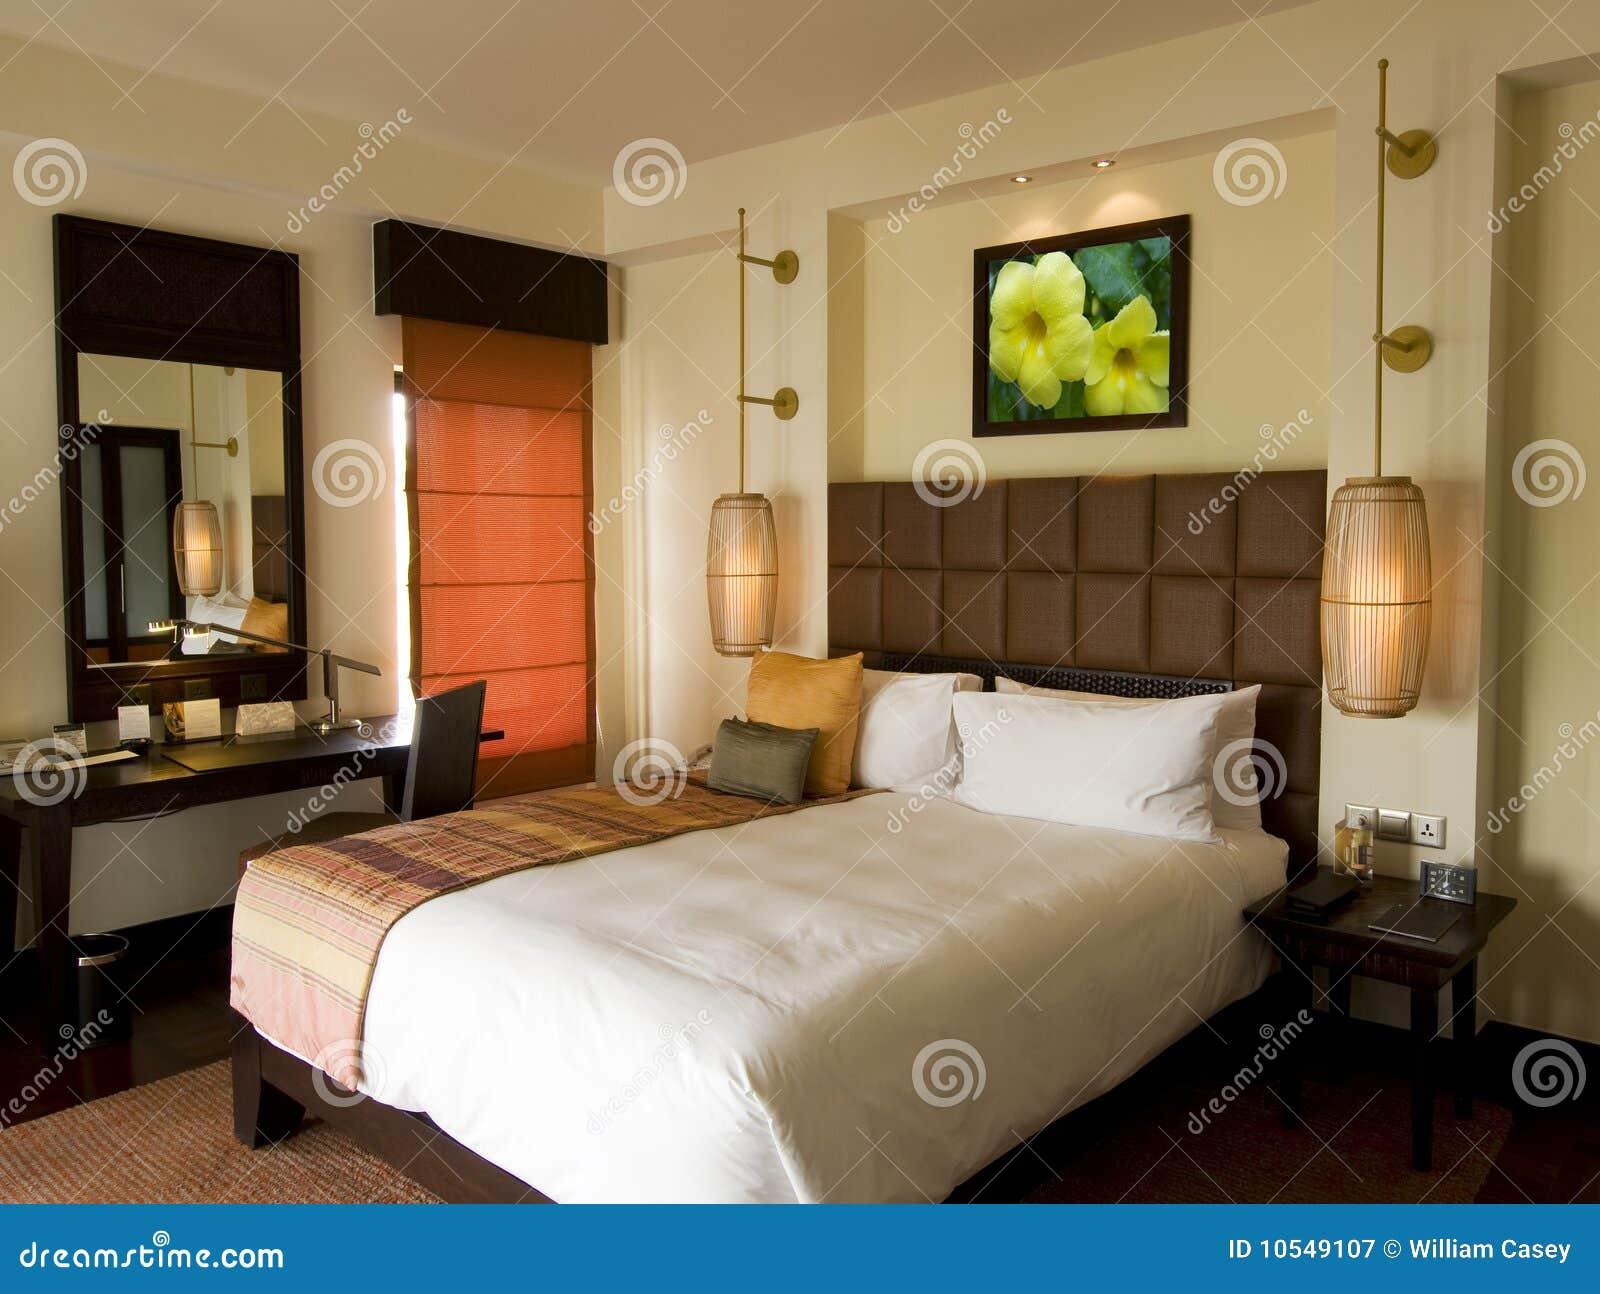 thai style tropical hotel bedroom stock image image of sleeping duvet 10549107